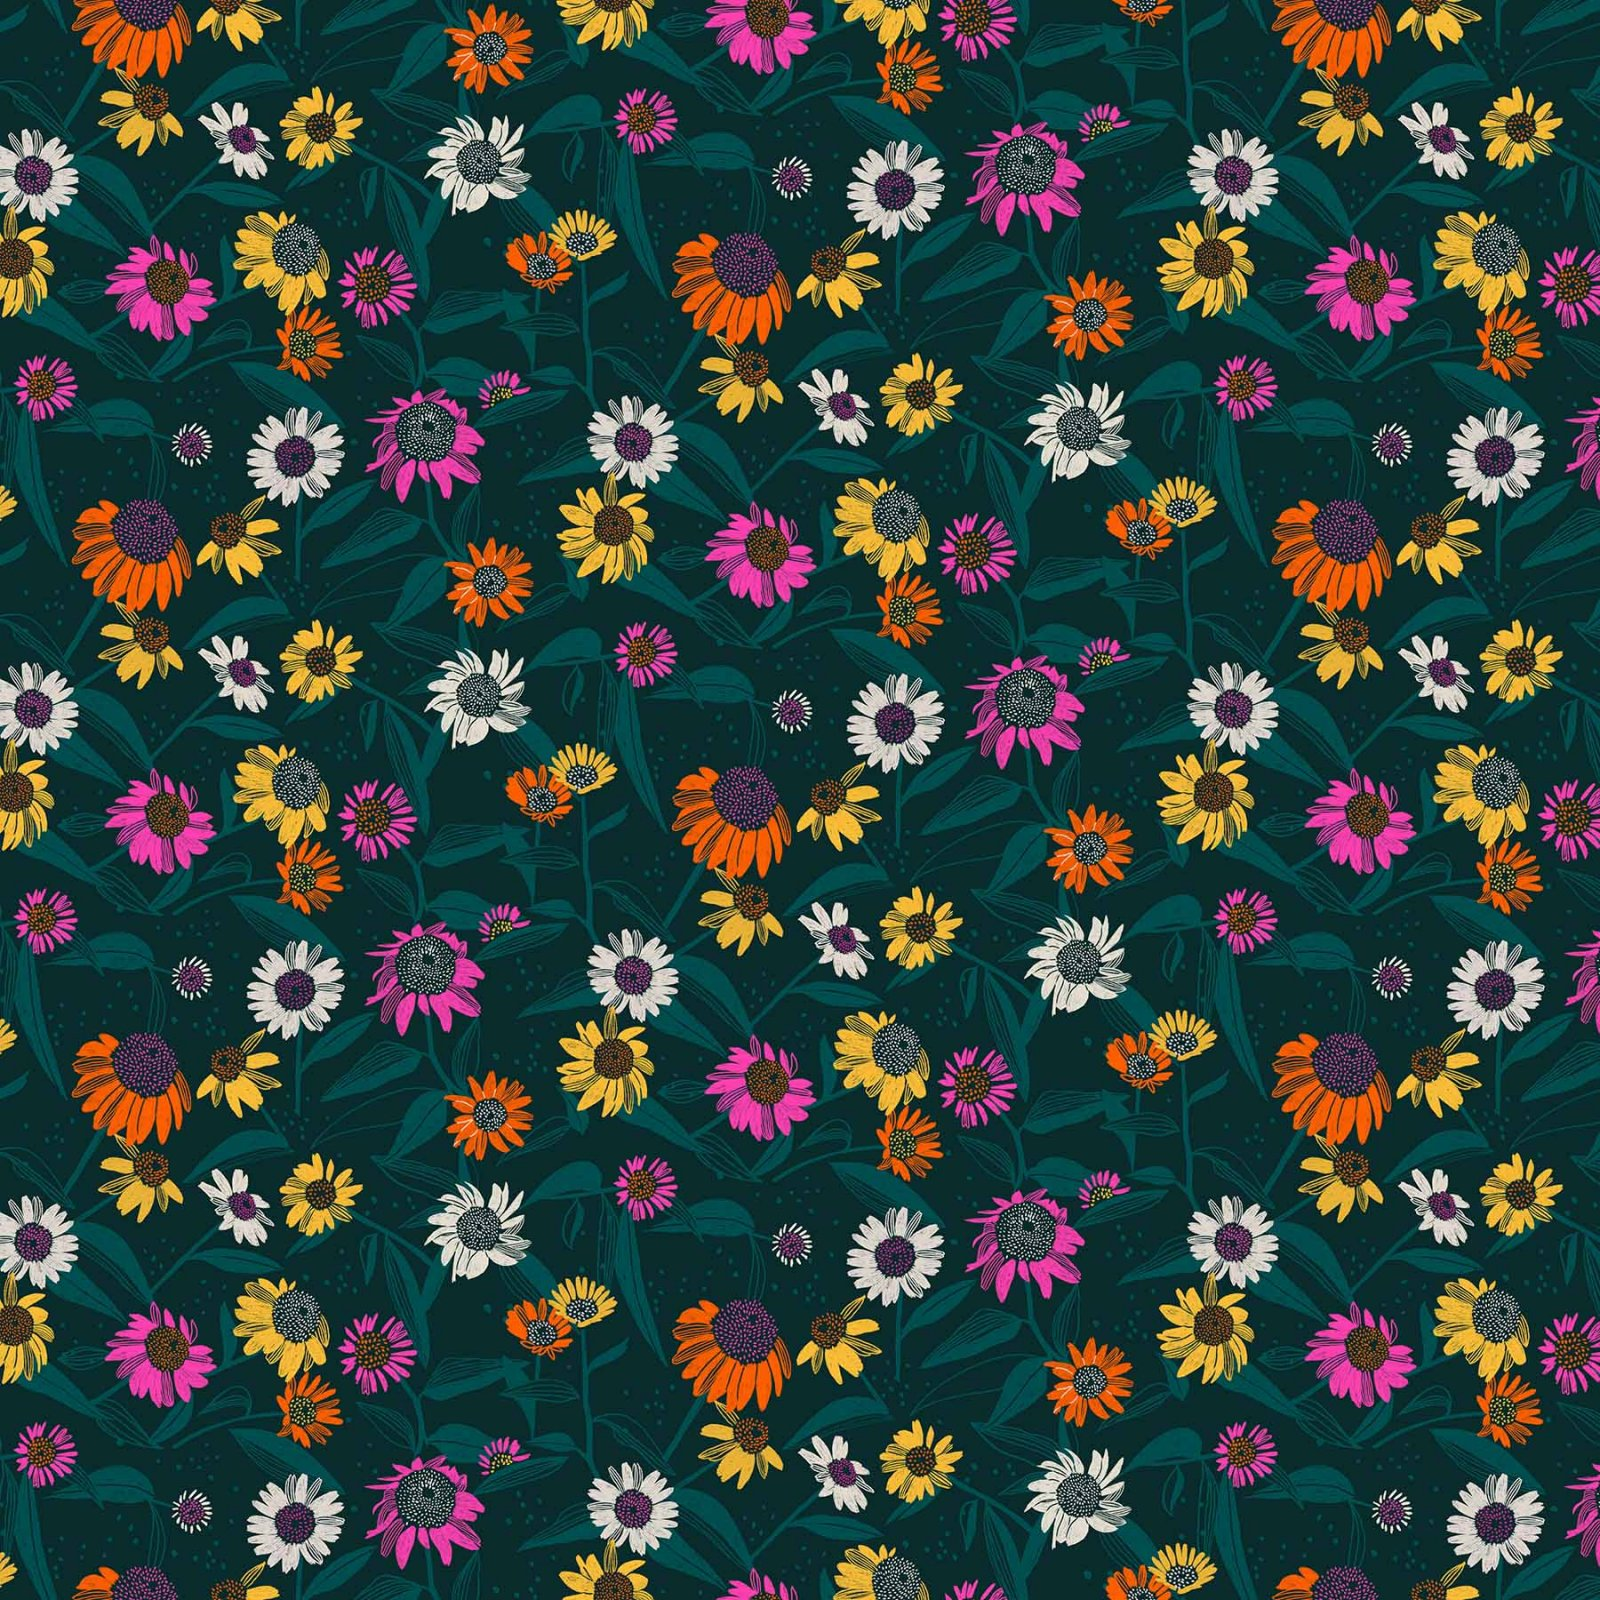 Flora Echinacea Dk. Teal